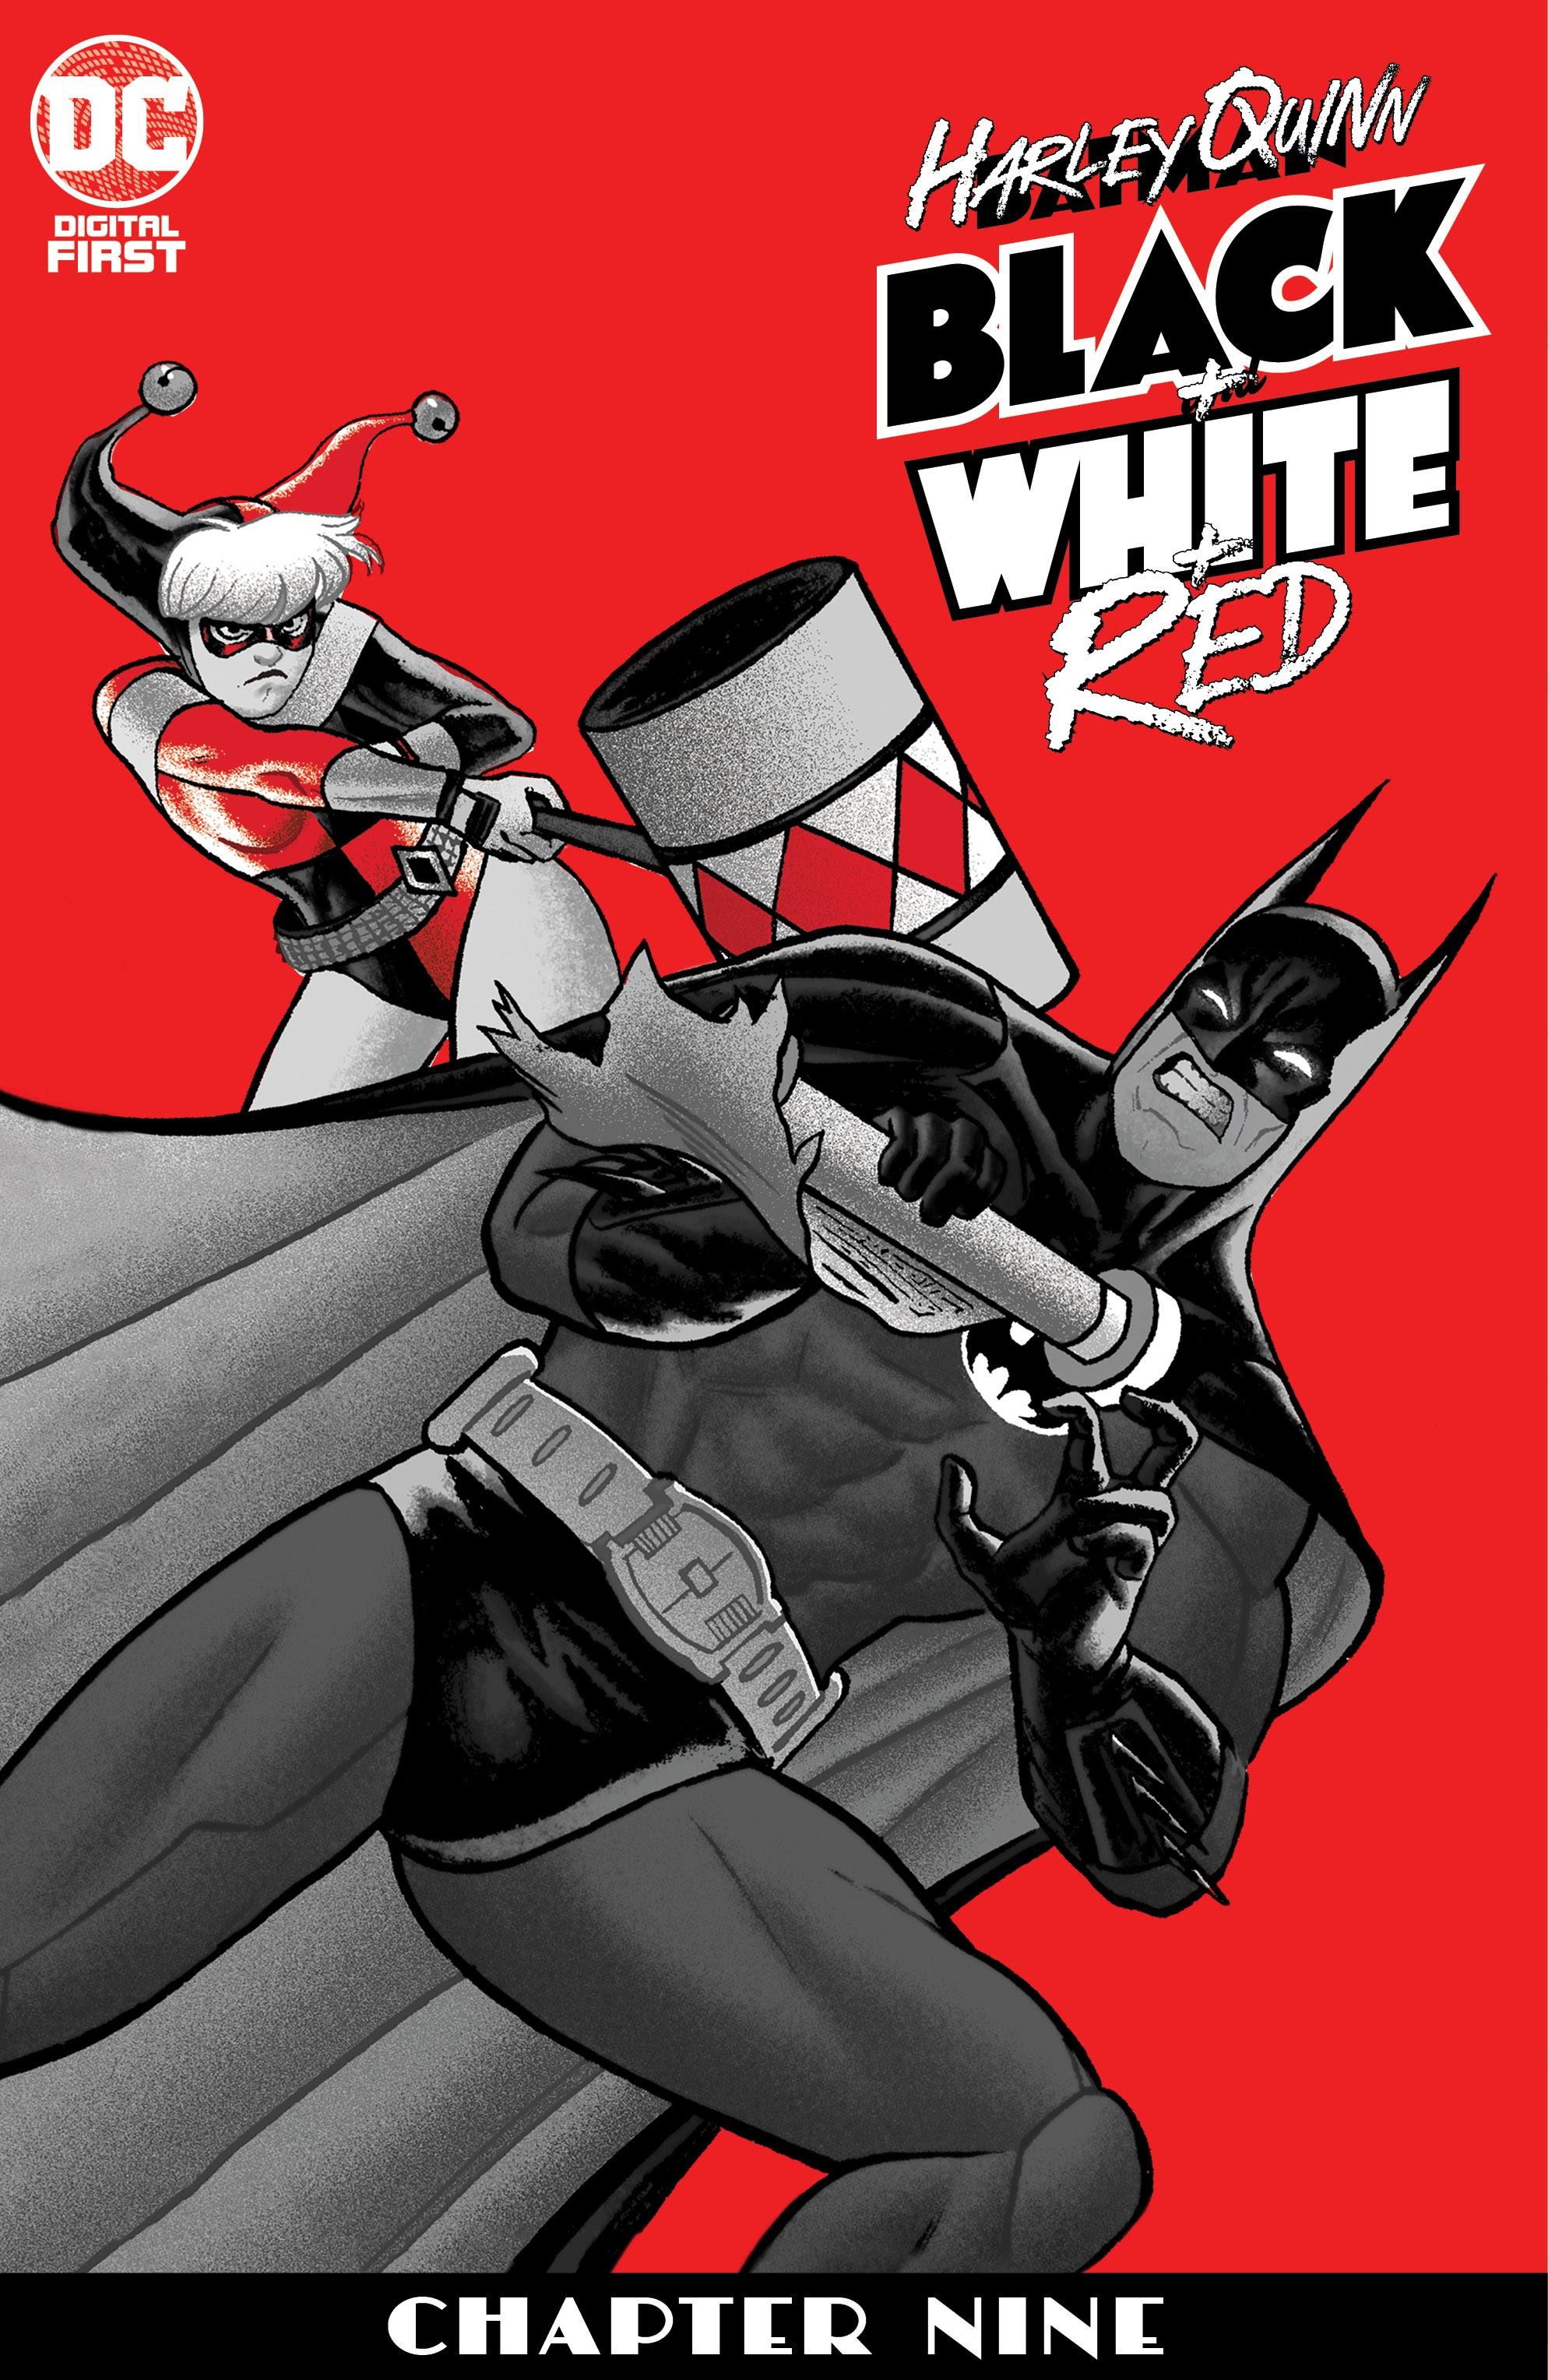 Harley Quinn: Black + White + Red Vol 1 9 (Digital)